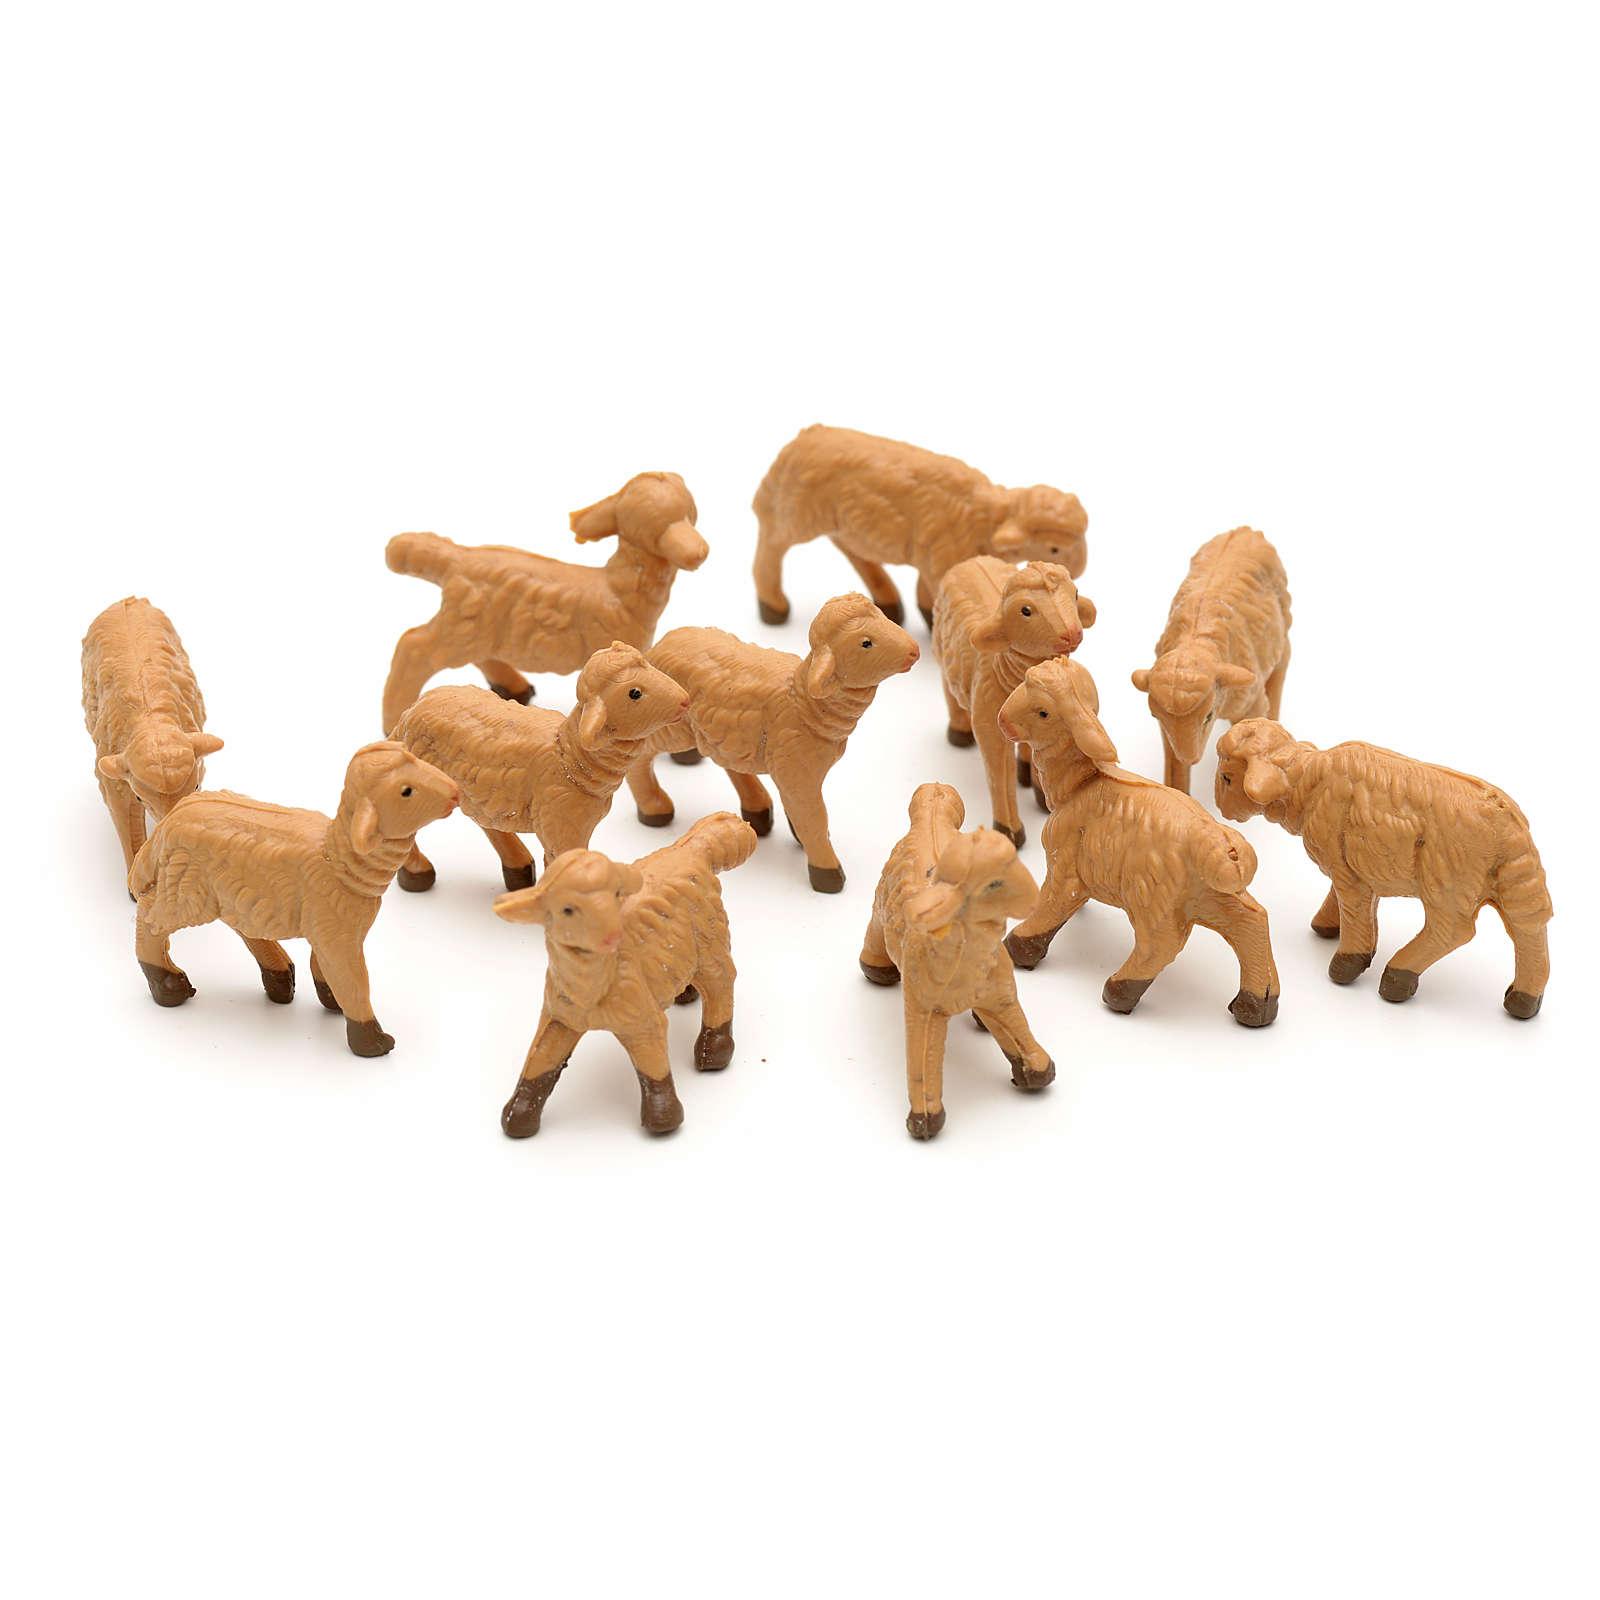 Pecore assortite 12 pezzi per presepe di altezza media 6,5 cm Fontanini 3